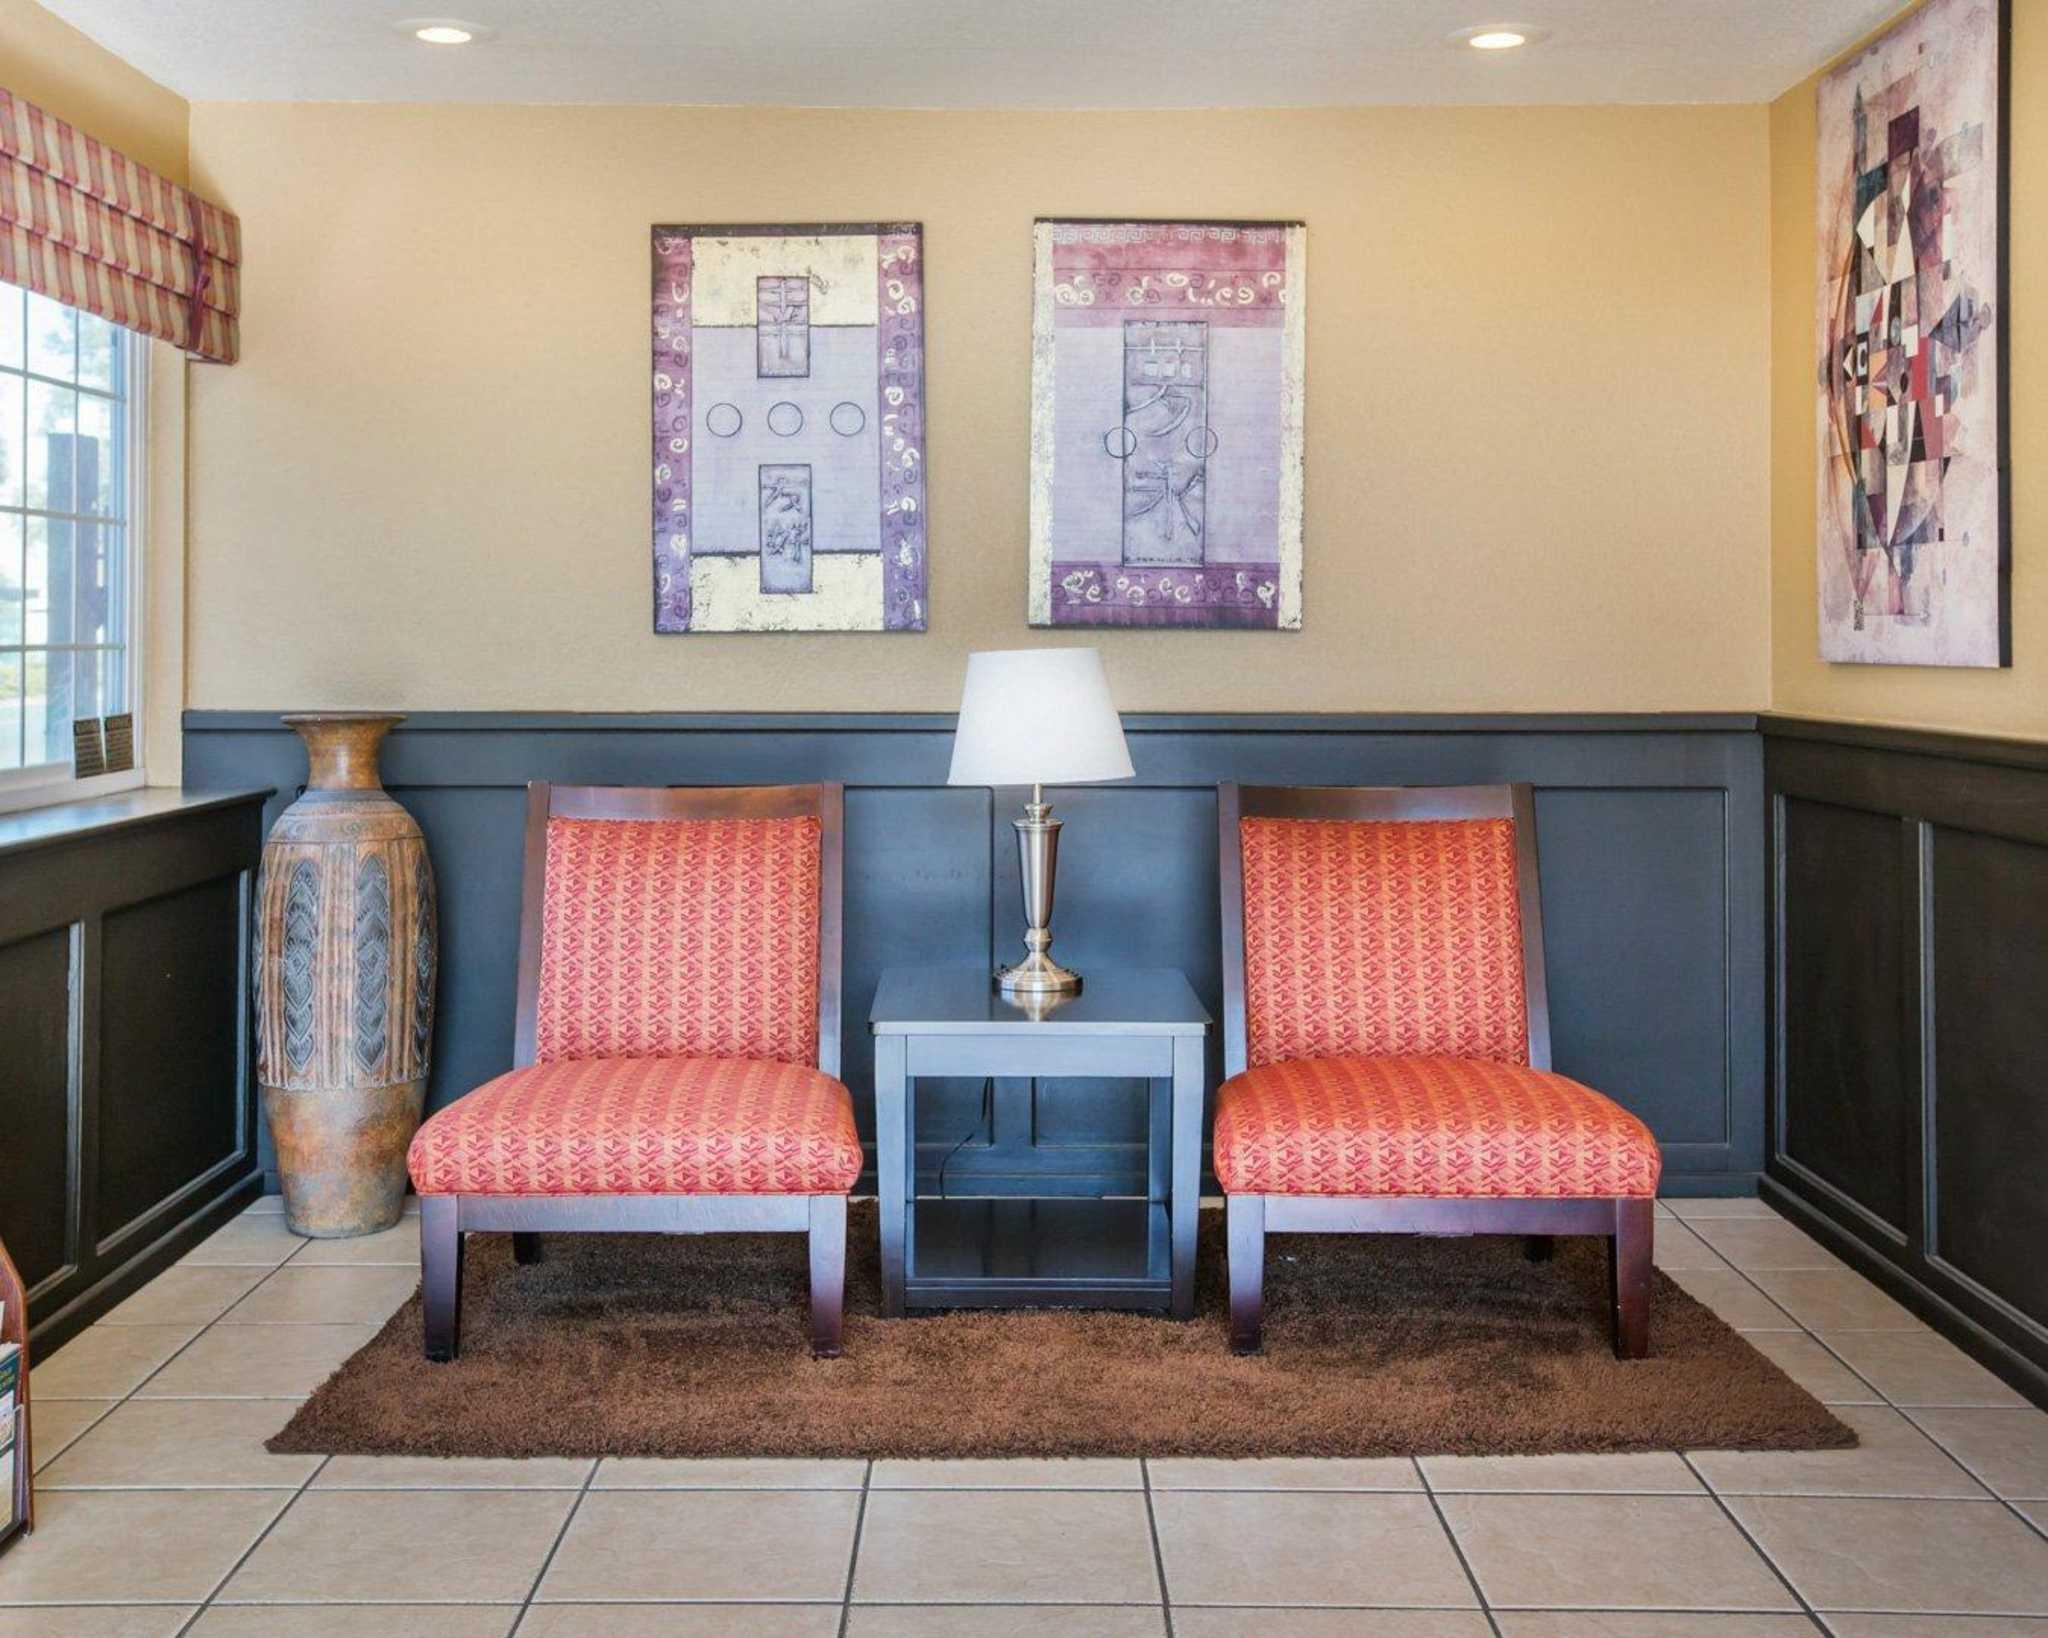 Econo Lodge Inn & Suites Lodi image 6